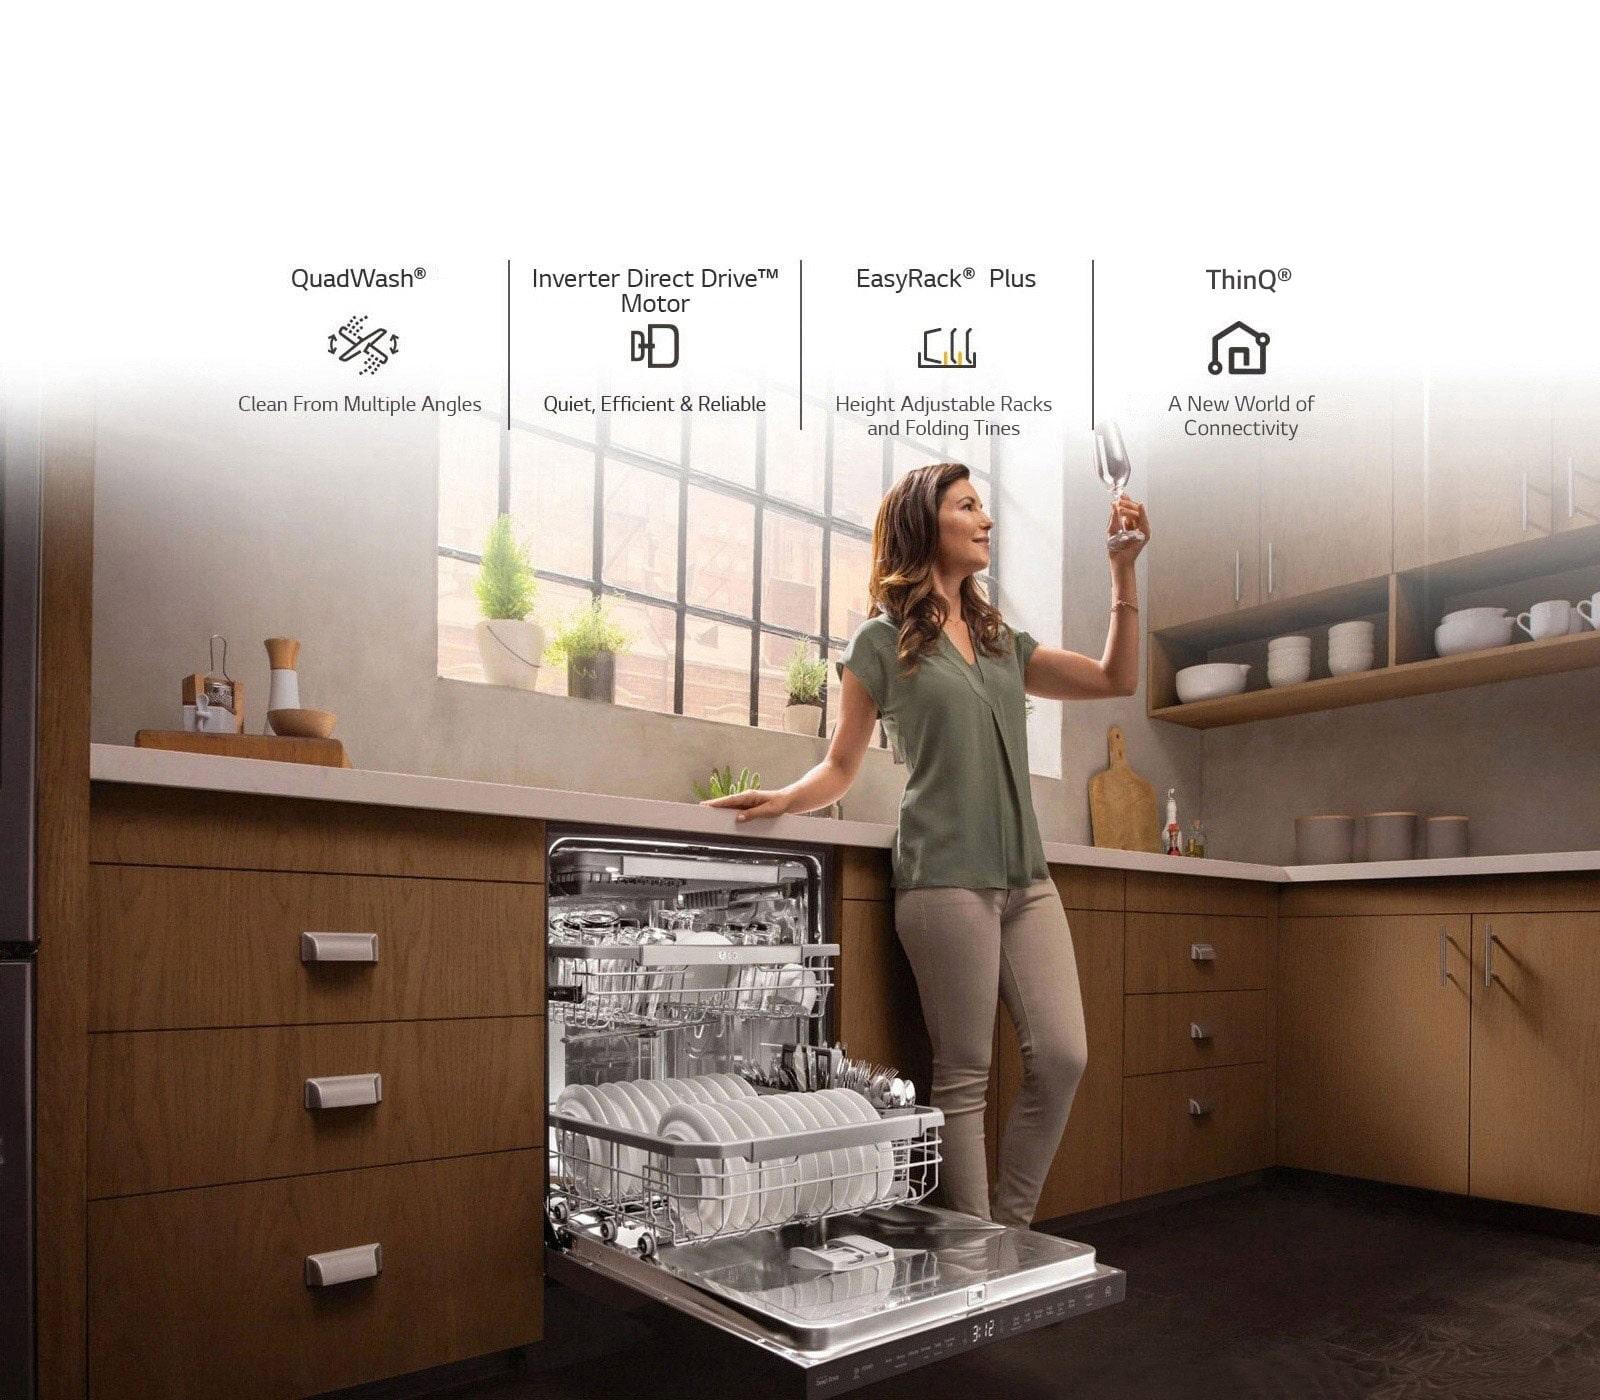 Four Reasons to Own an LG QuadWash® Dishwasher1